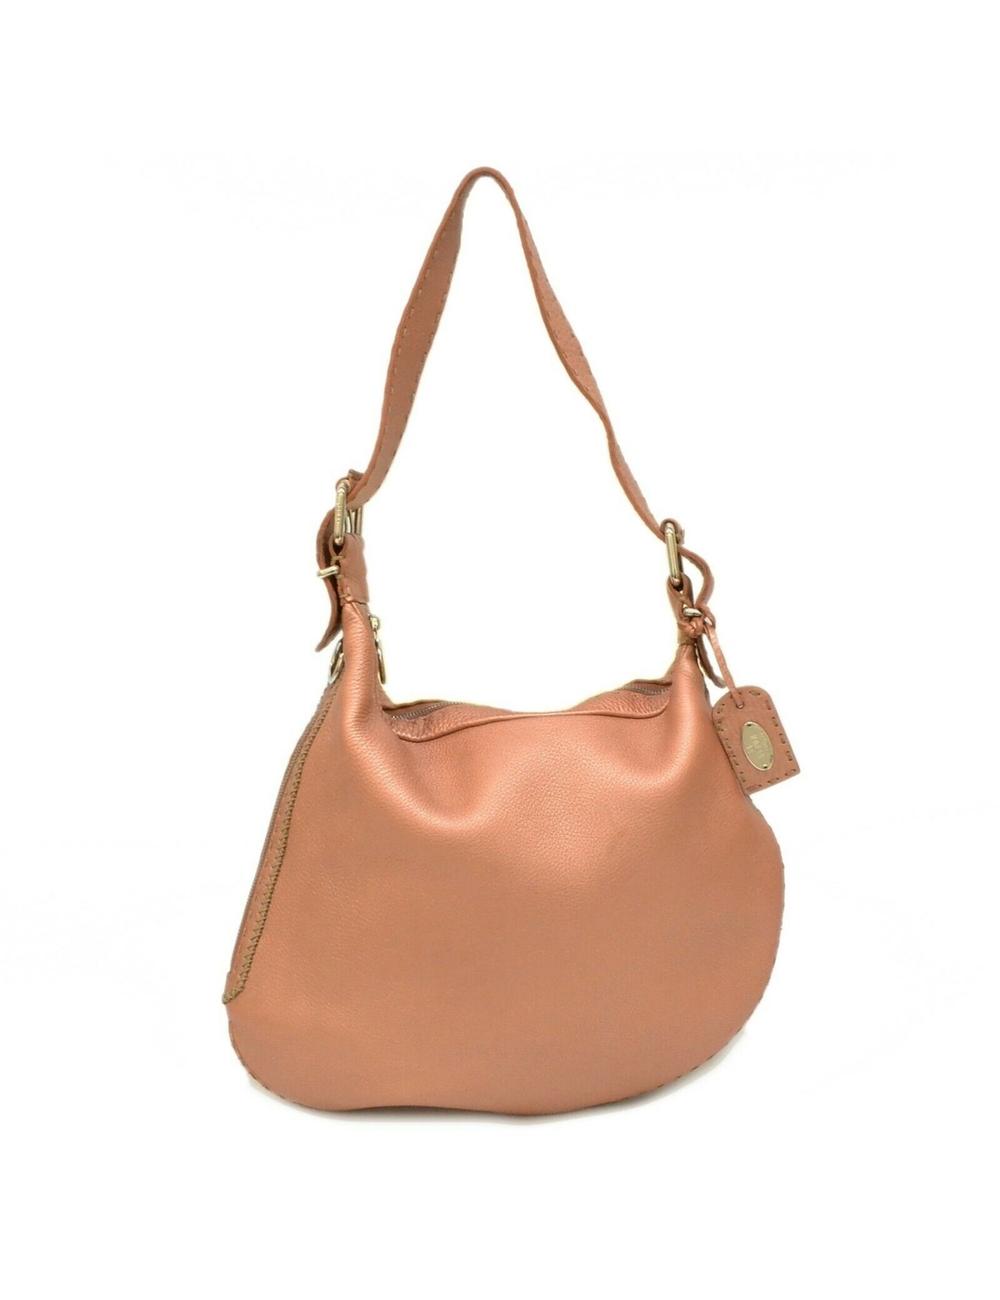 Name: Fendi Shoulder bag Brand: Fendi Dimensions: W 38 x H 23-26 x D 2 cm / W 14.96 x H 10.23-12.99